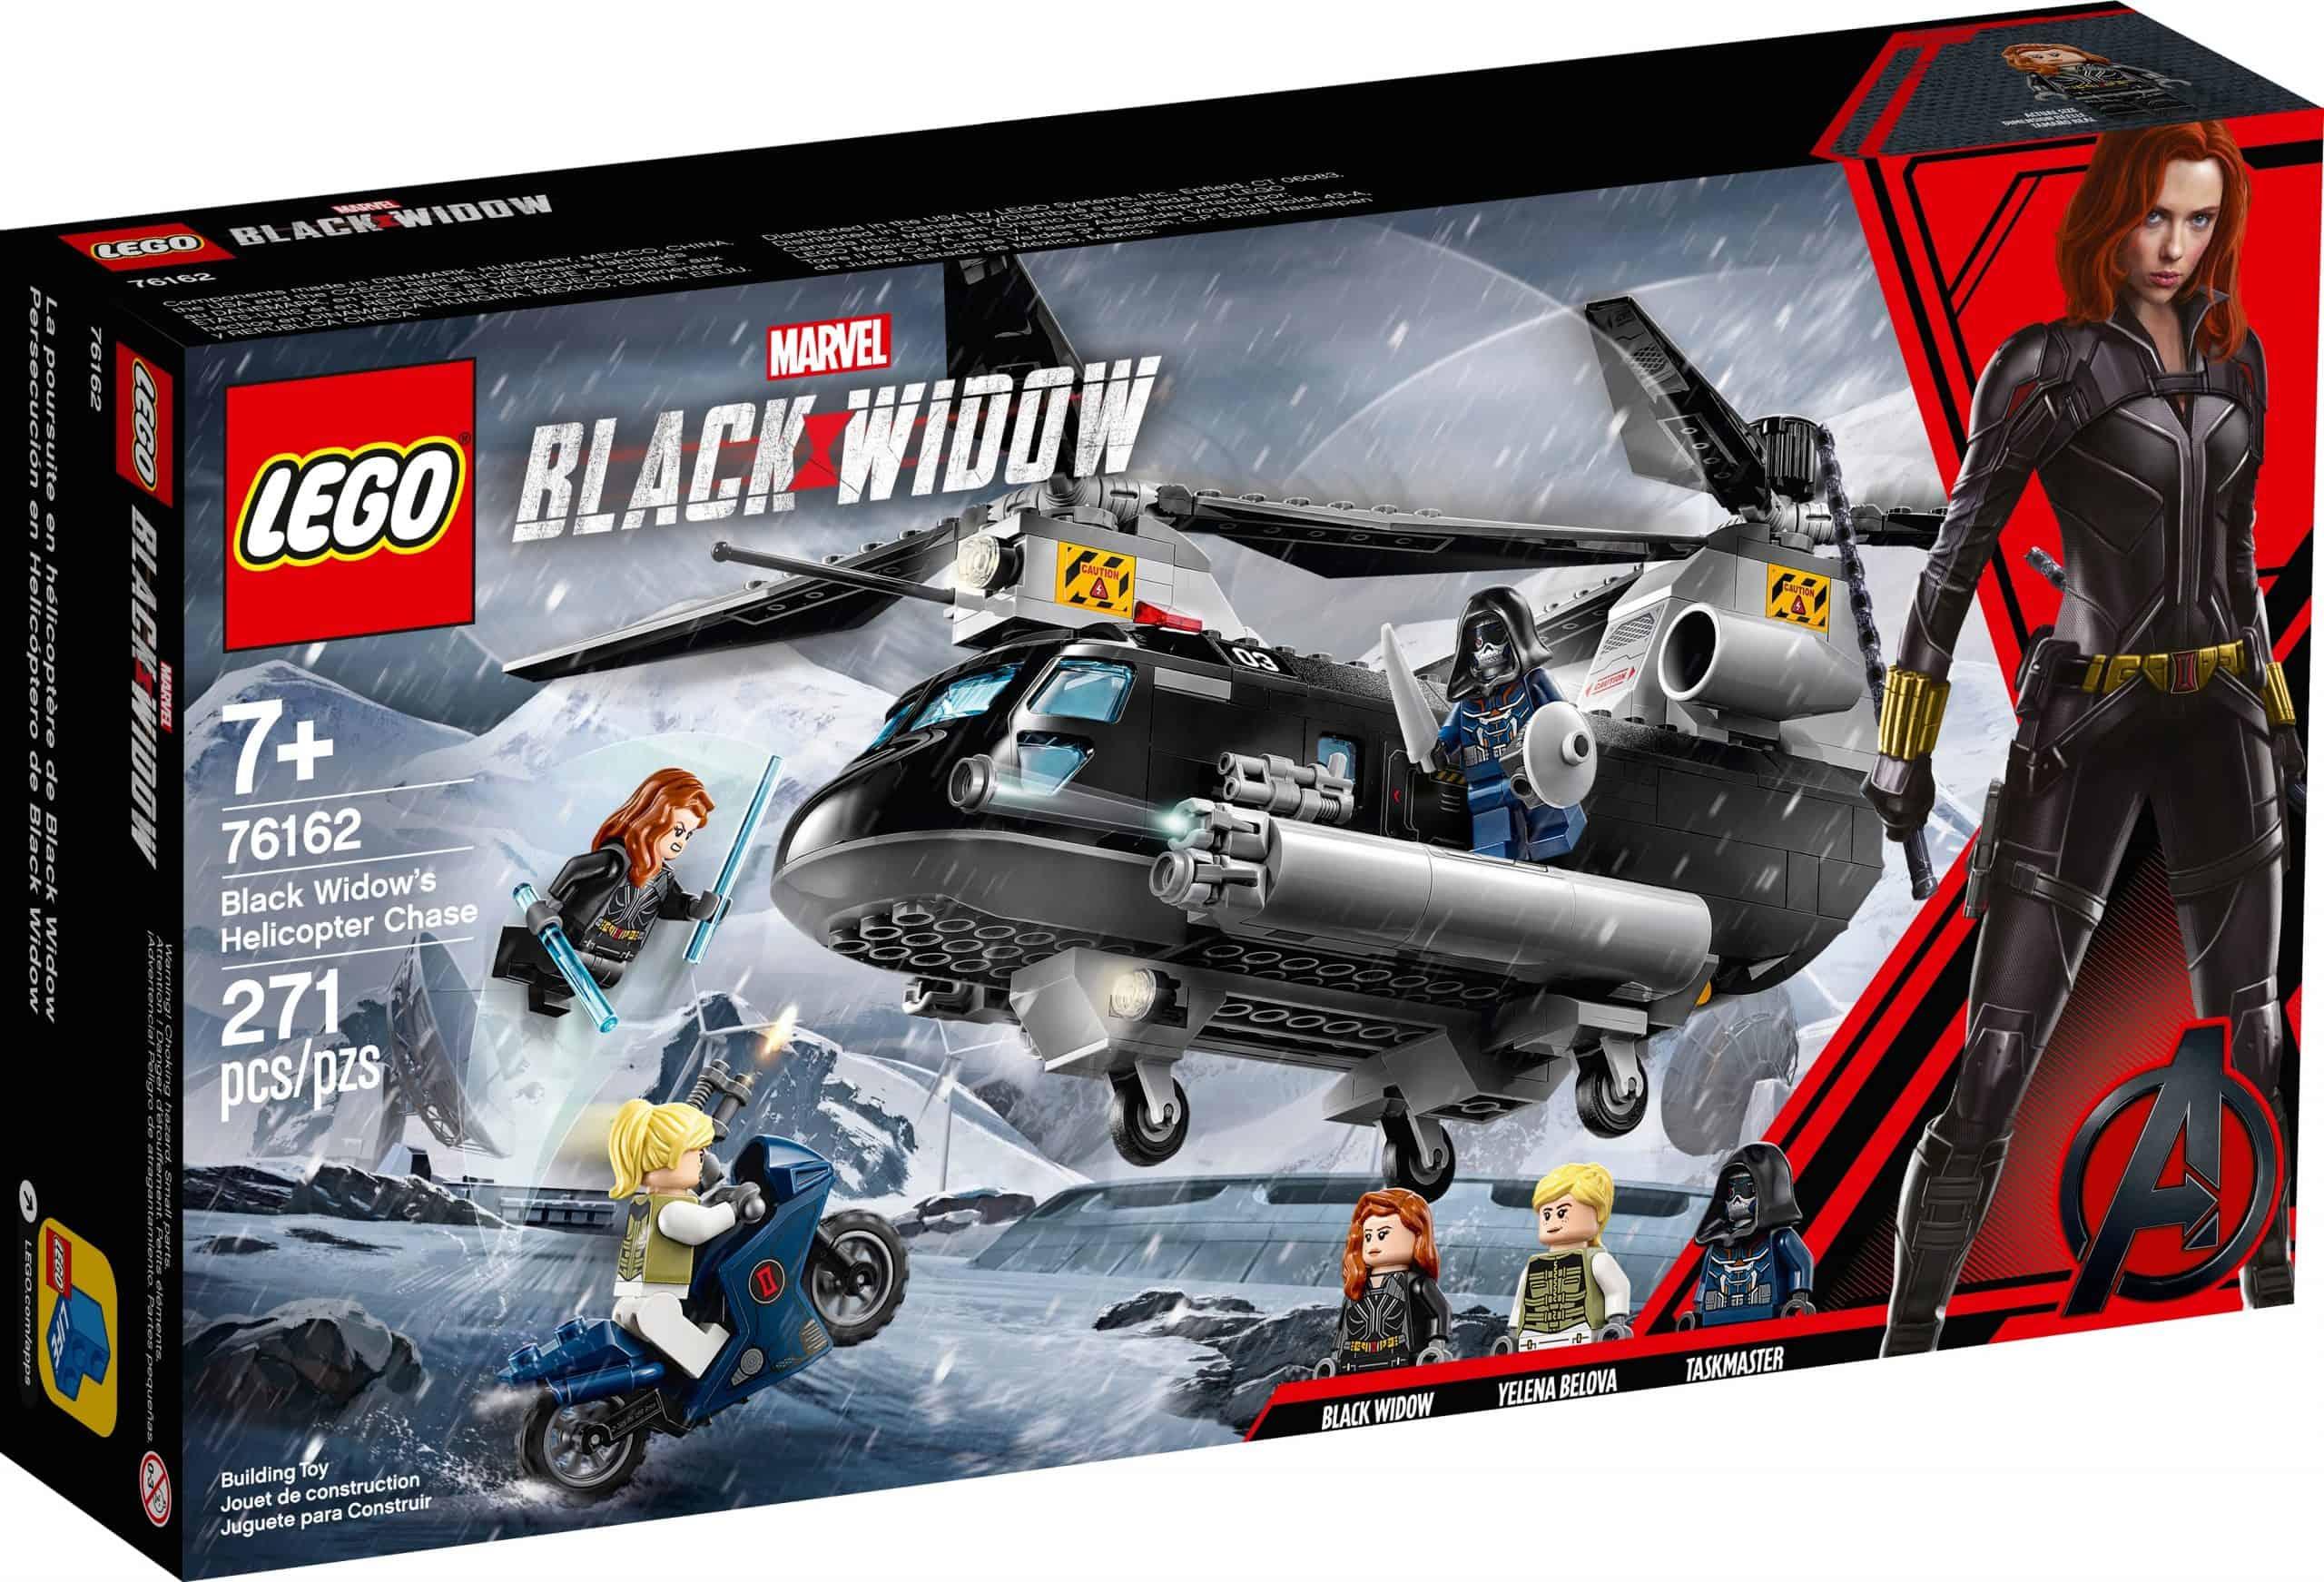 lego 76162 black widows helikopterjagt scaled